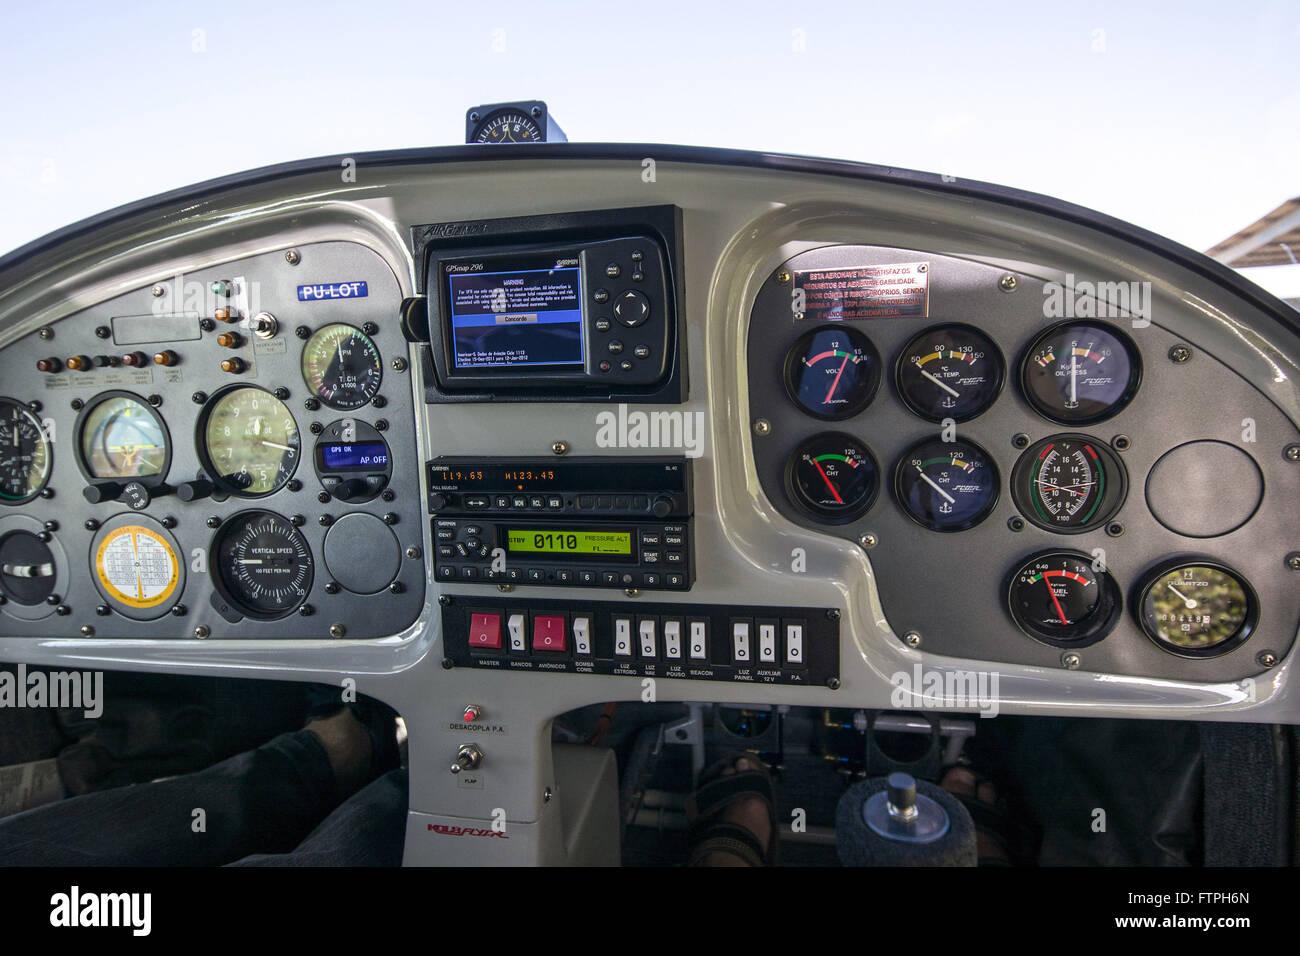 Twin-engine plane in panel Aerodromo Severino Lopes - Stock Image